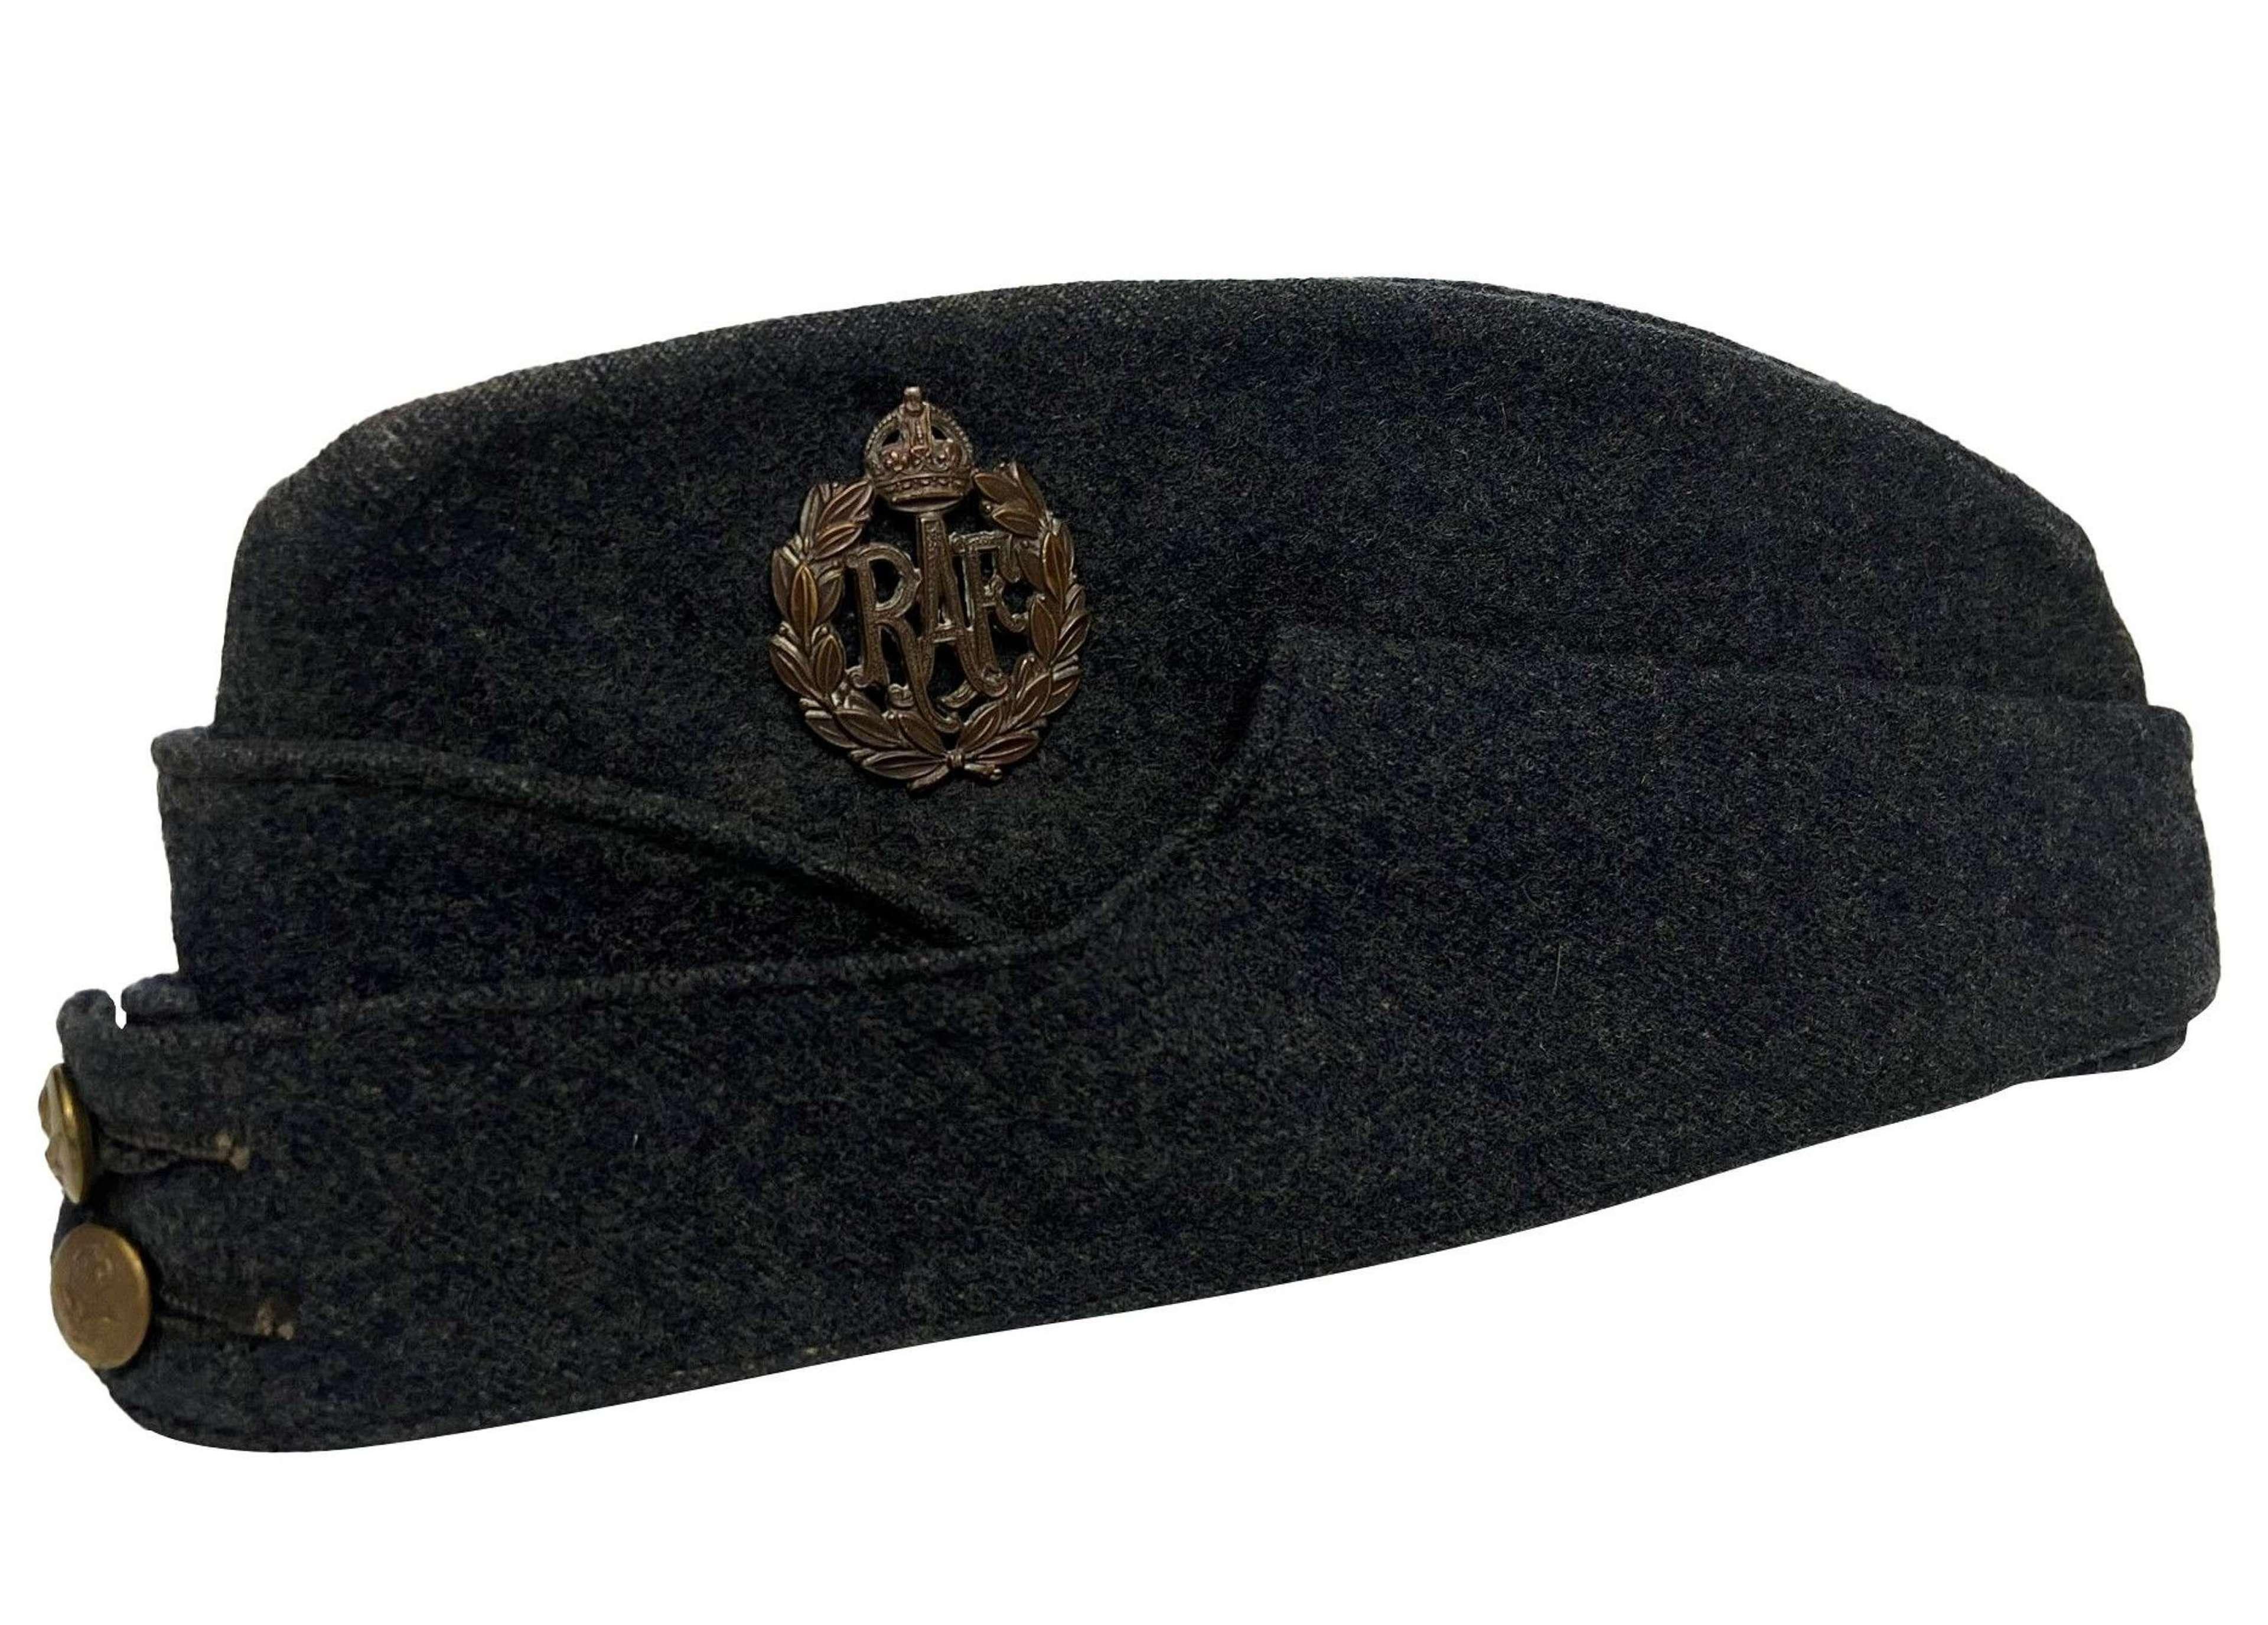 Original 1942 Dated RAF Ordinary Airman's Forage Cap